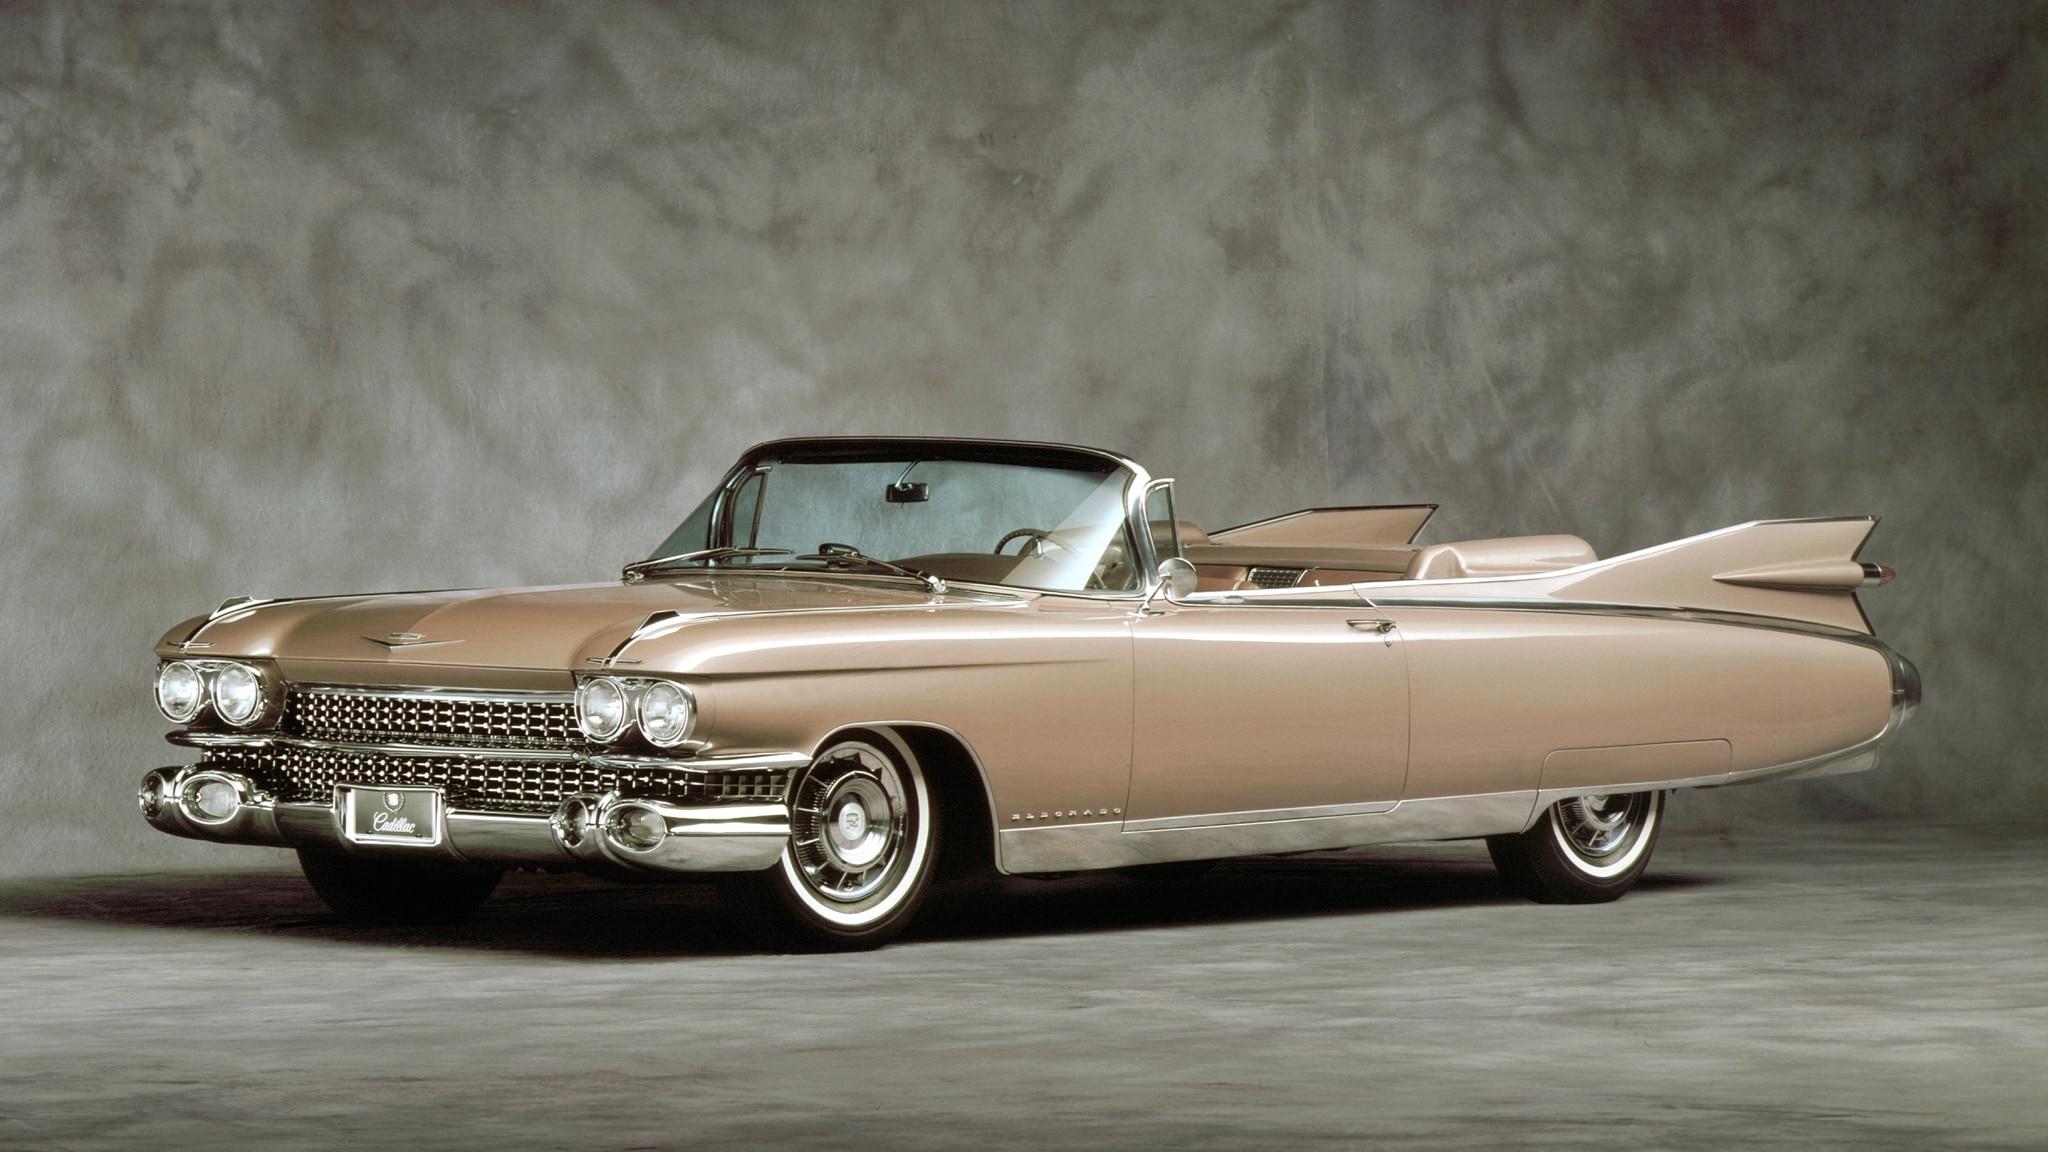 cadillac s most innovative cars high tech history cadillac s most innovative cars high